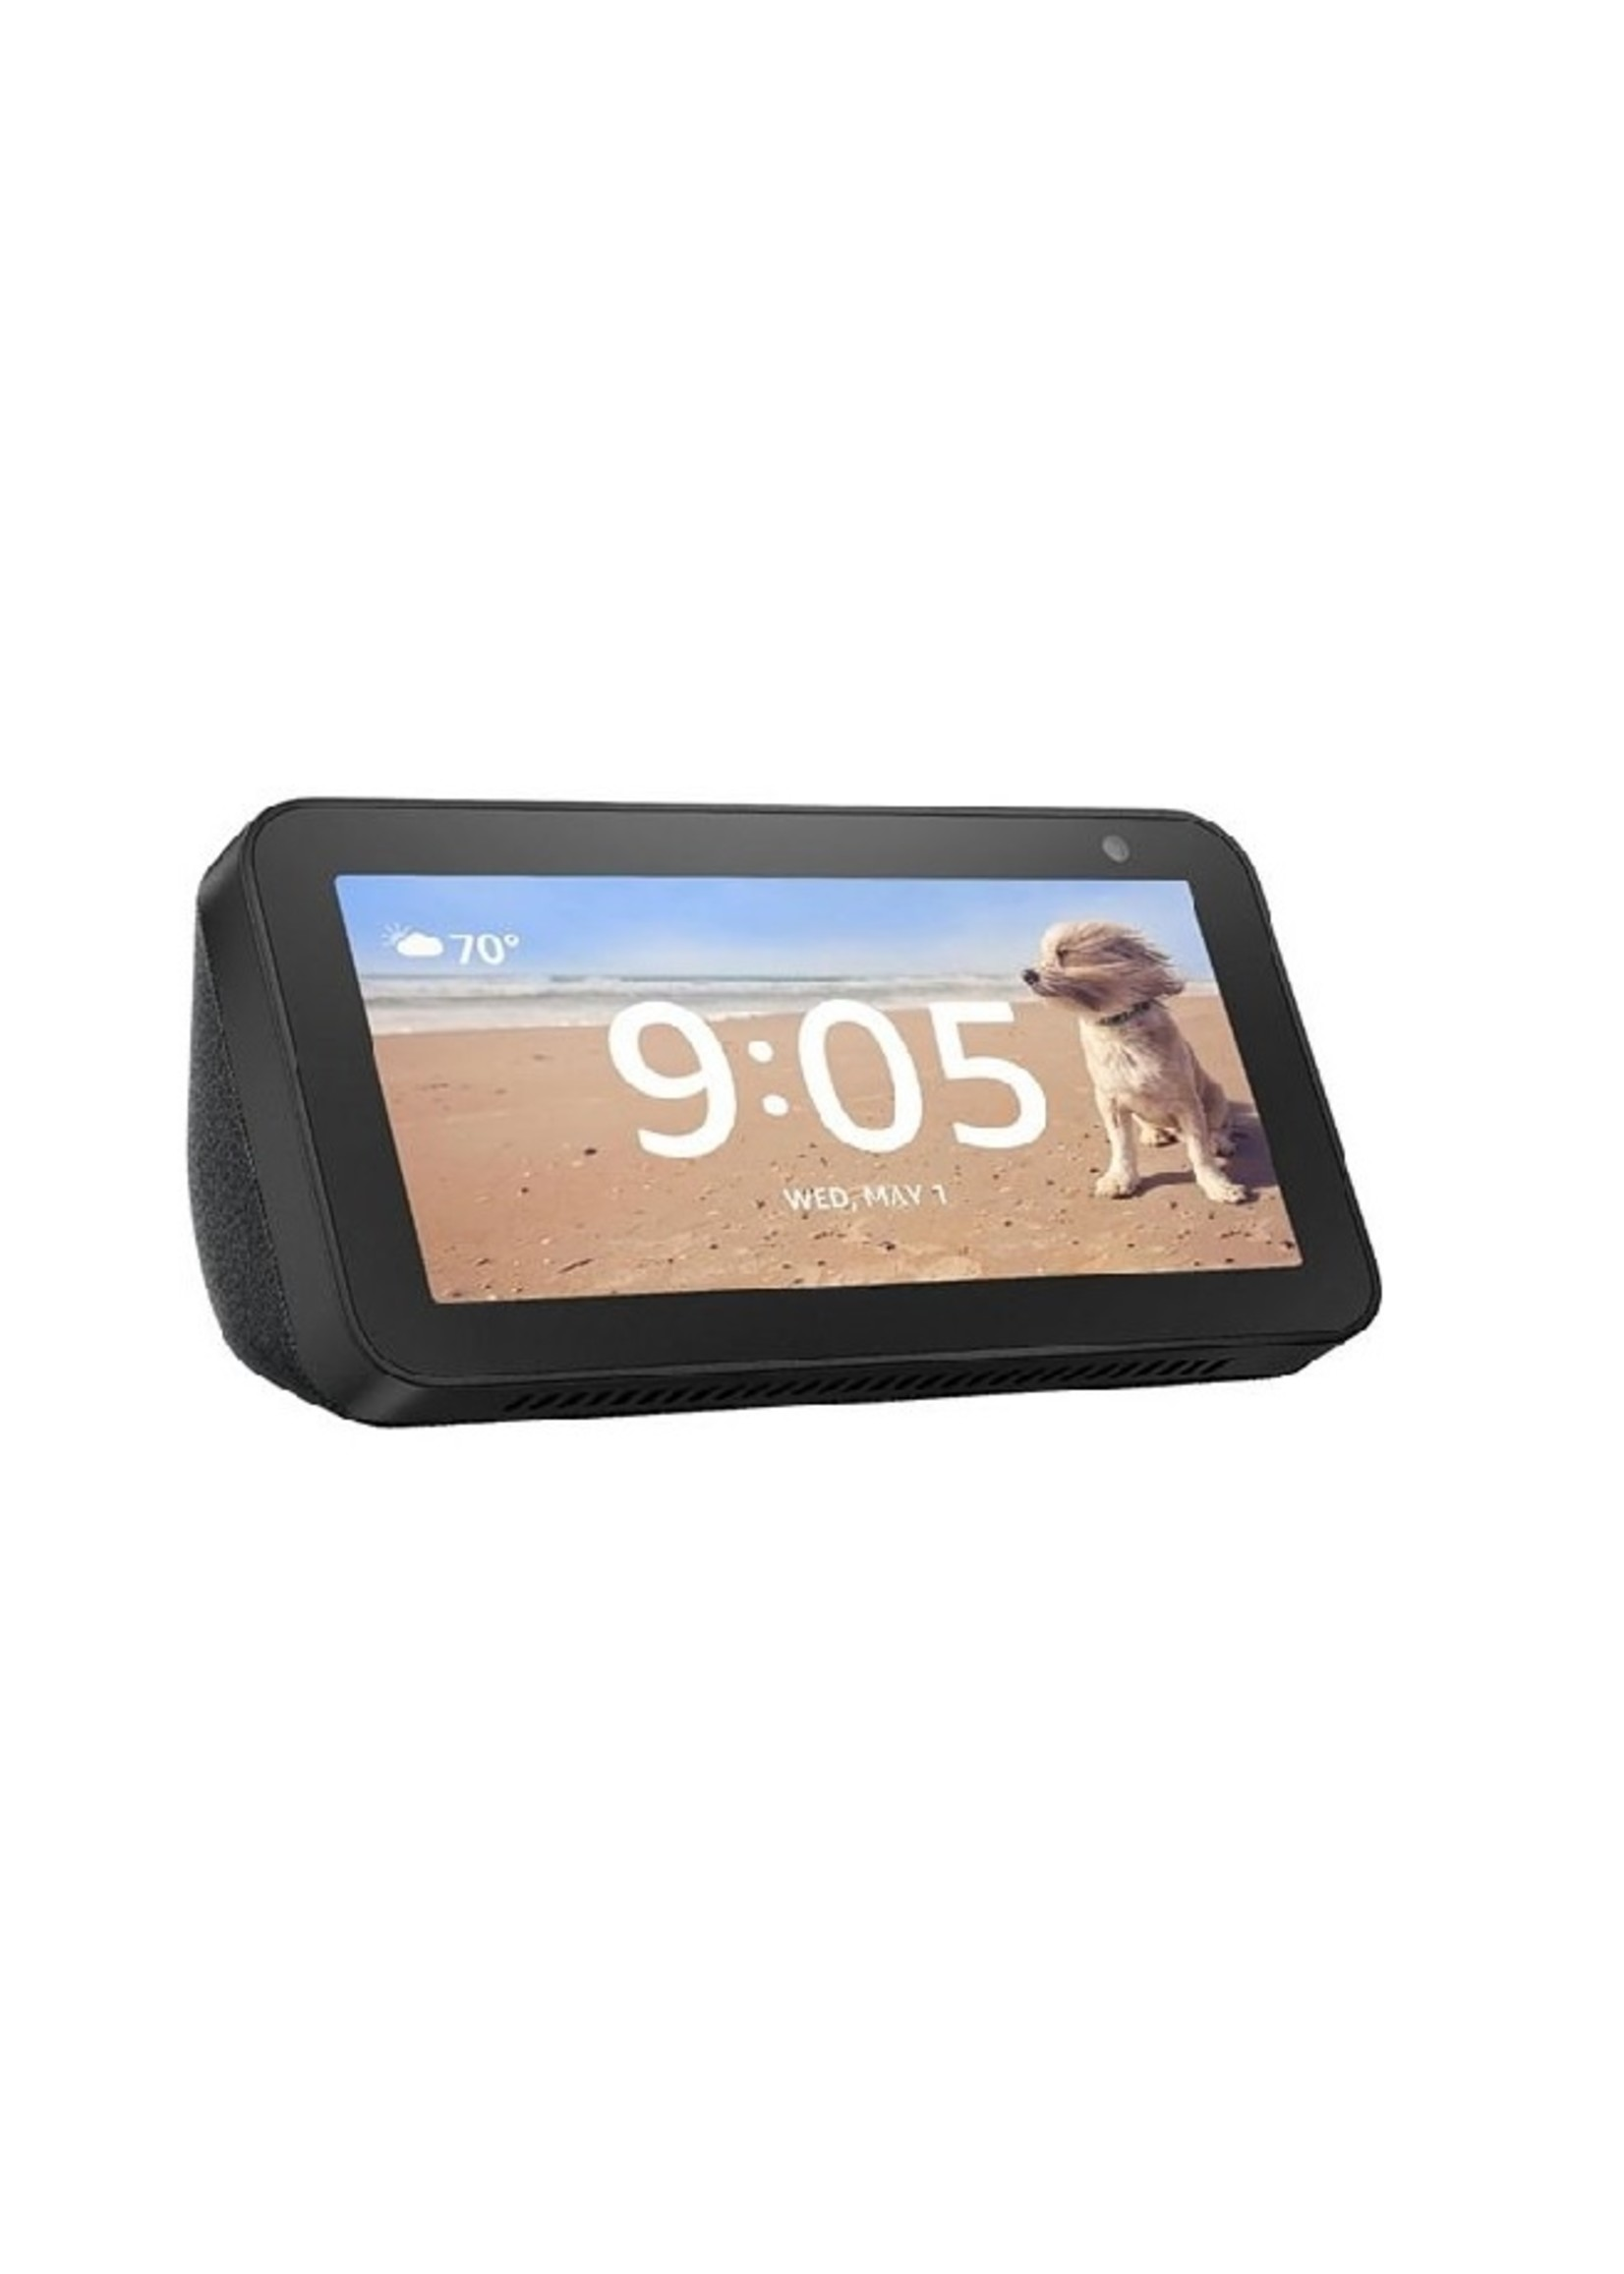 "Amazon Amazon Echo Show 5 Alexa Speaker with 5.5"" Screen"